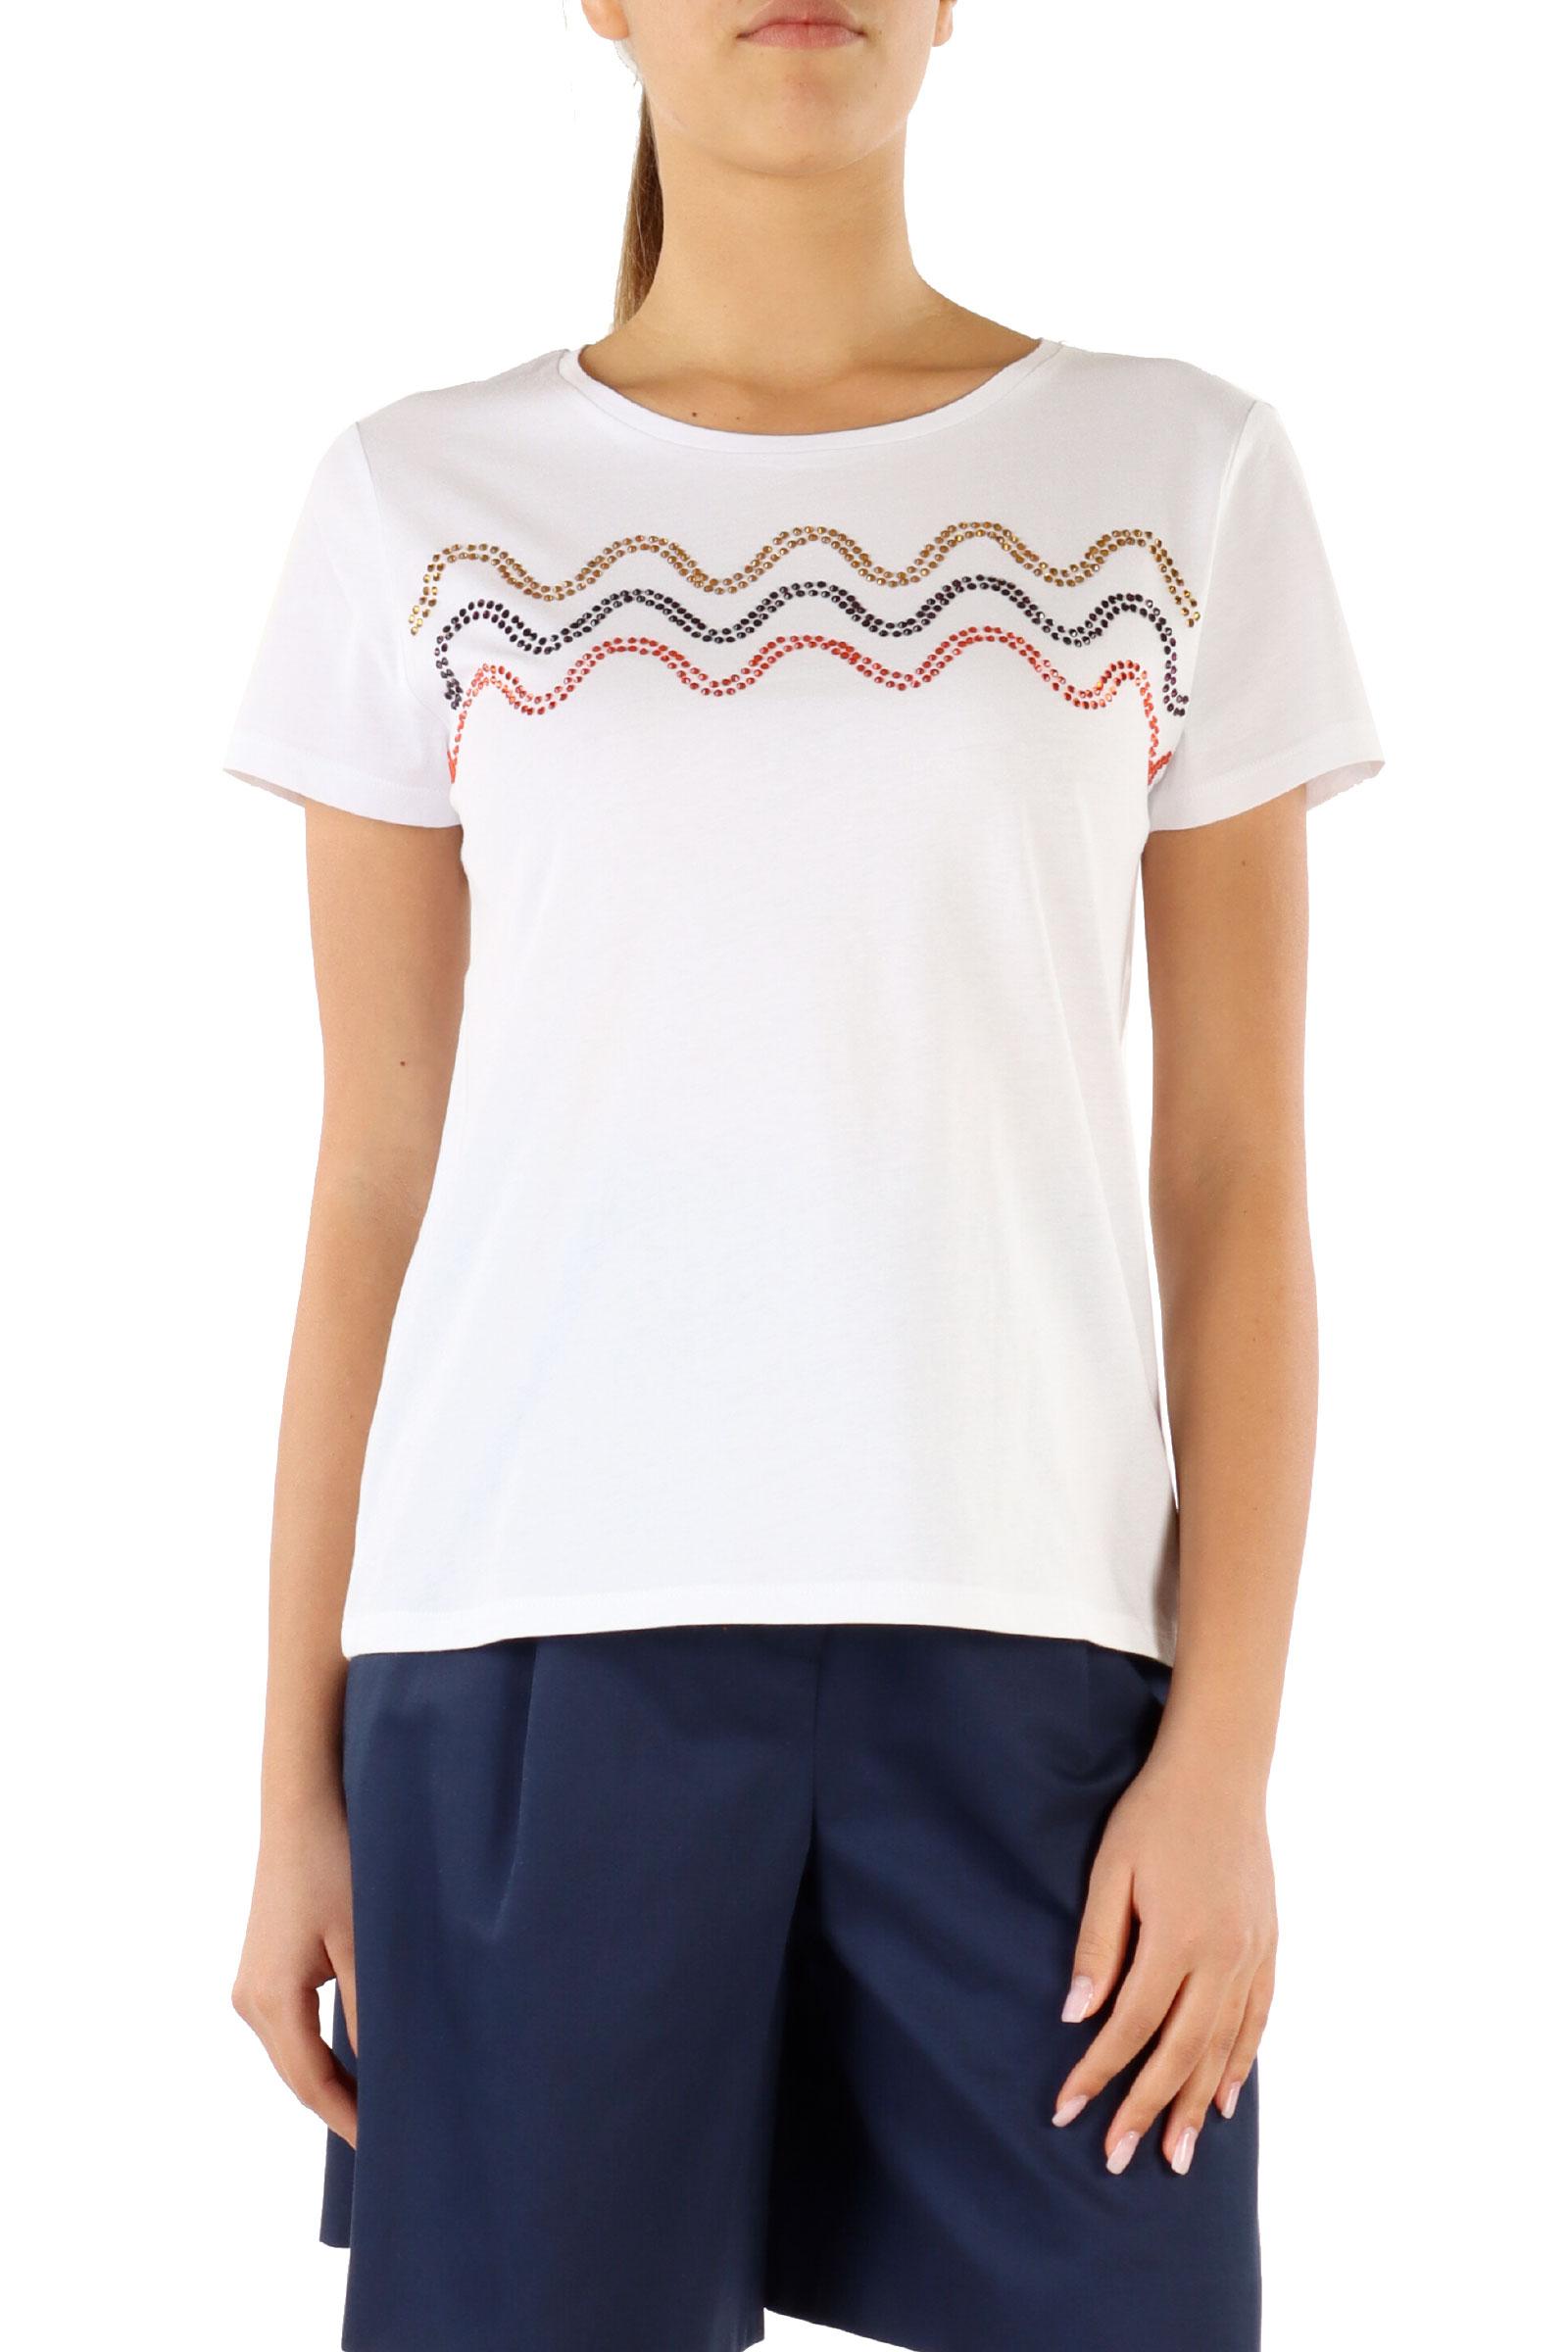 EMME MARELLA T-shirt Modello CANNES EMME MARELLA | T-Shirt | 59710114000001